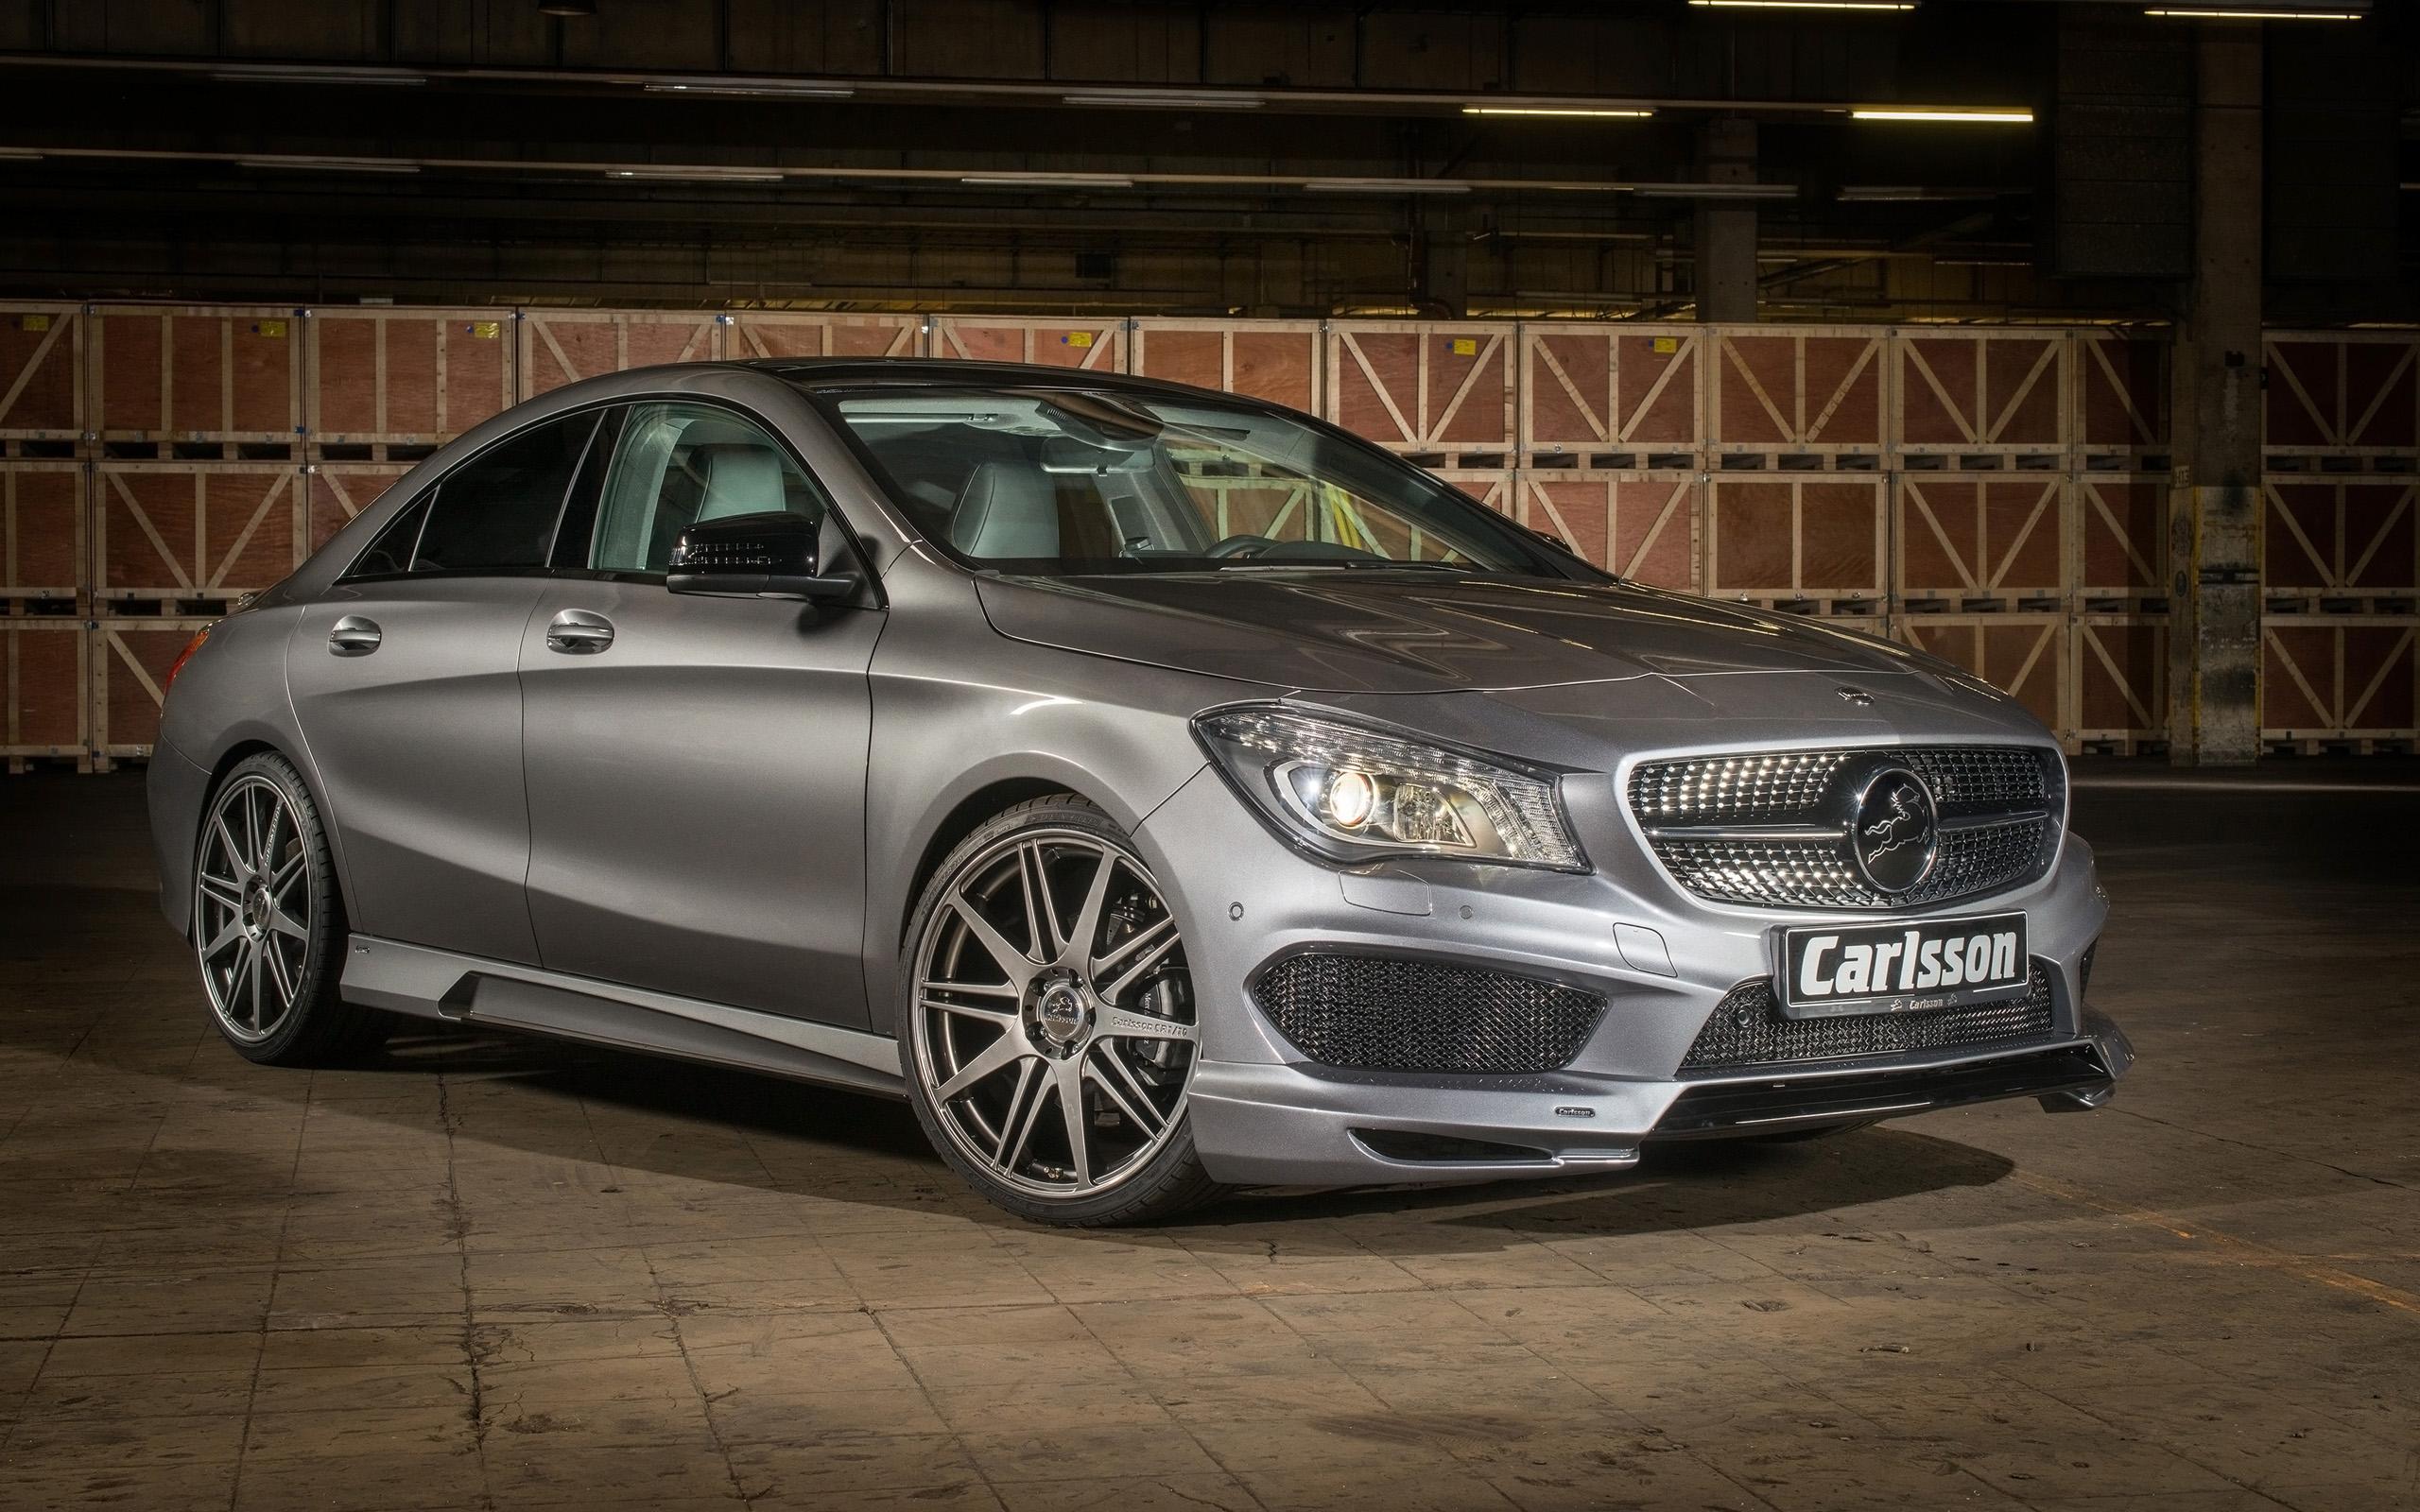 2014 Carlsson Mercedes Benz CLA45 AMG Wallpaper | HD Car ...